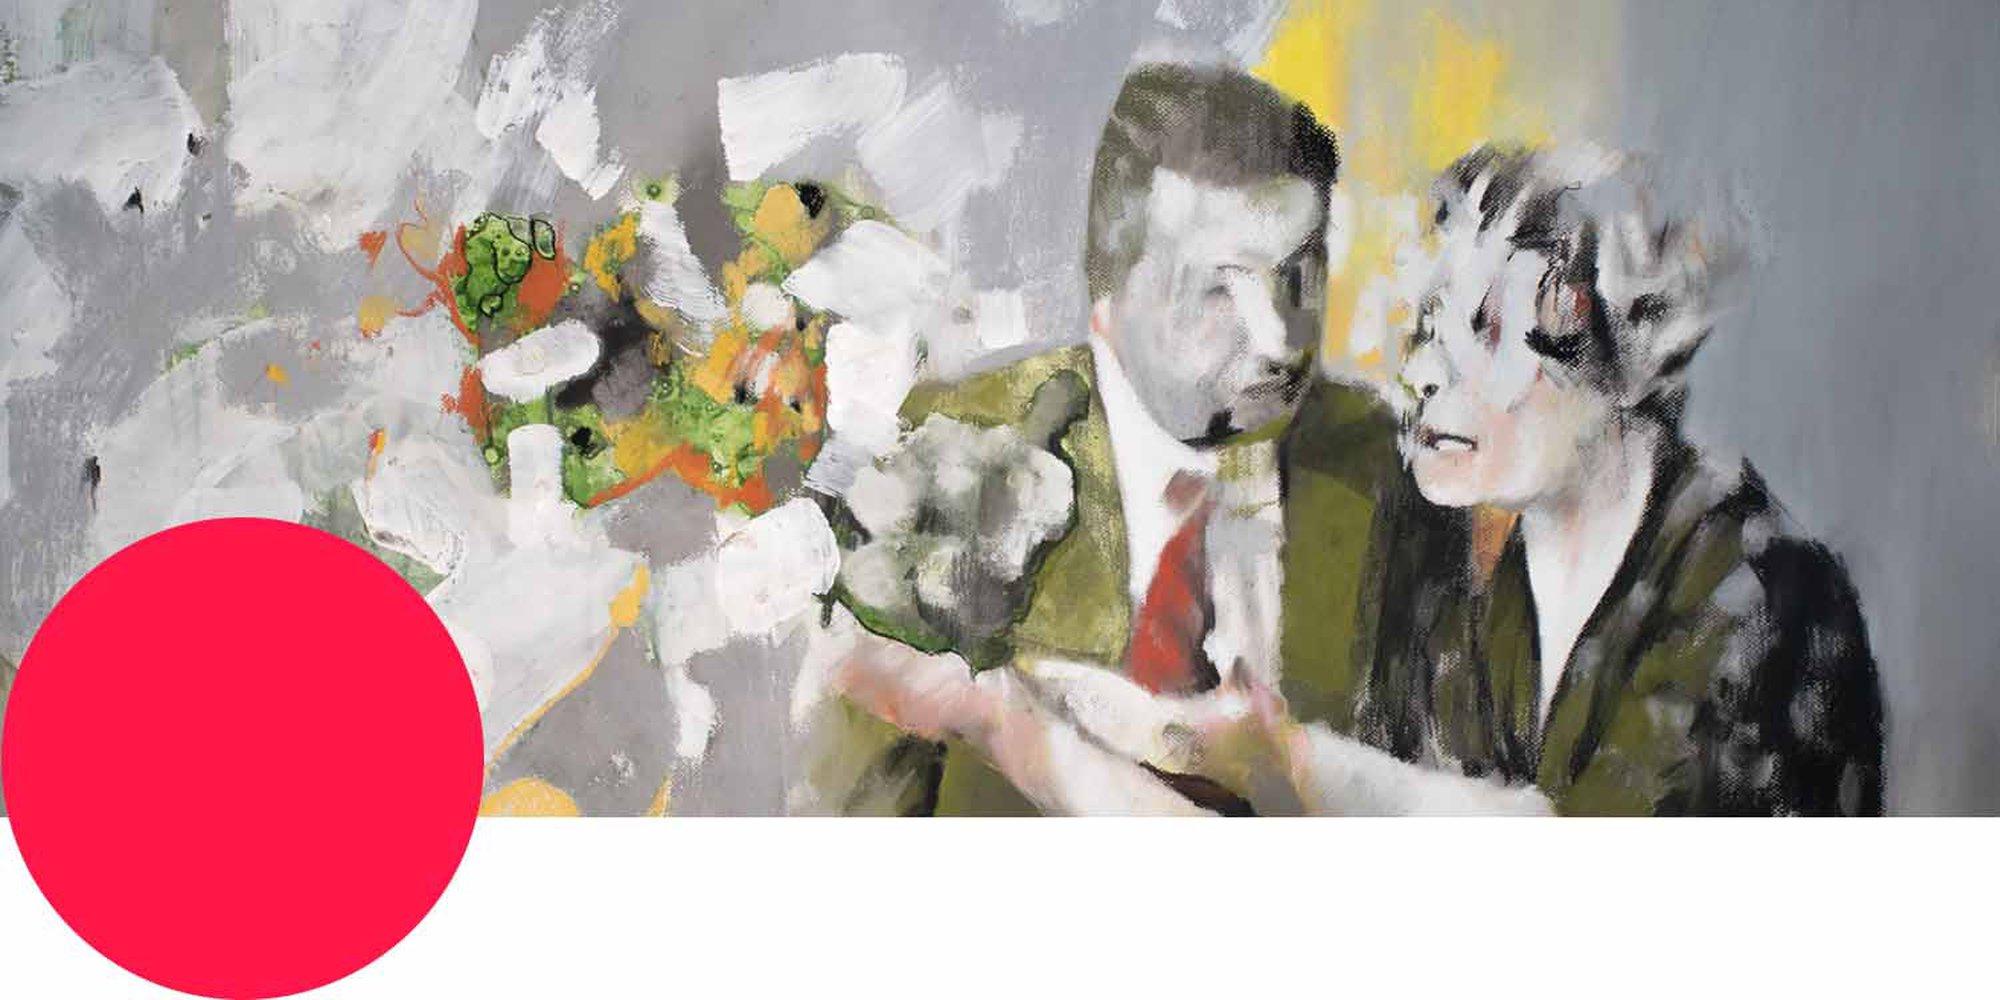 What's in a face? Dan Laurentiu Arcus on redefining portraiture